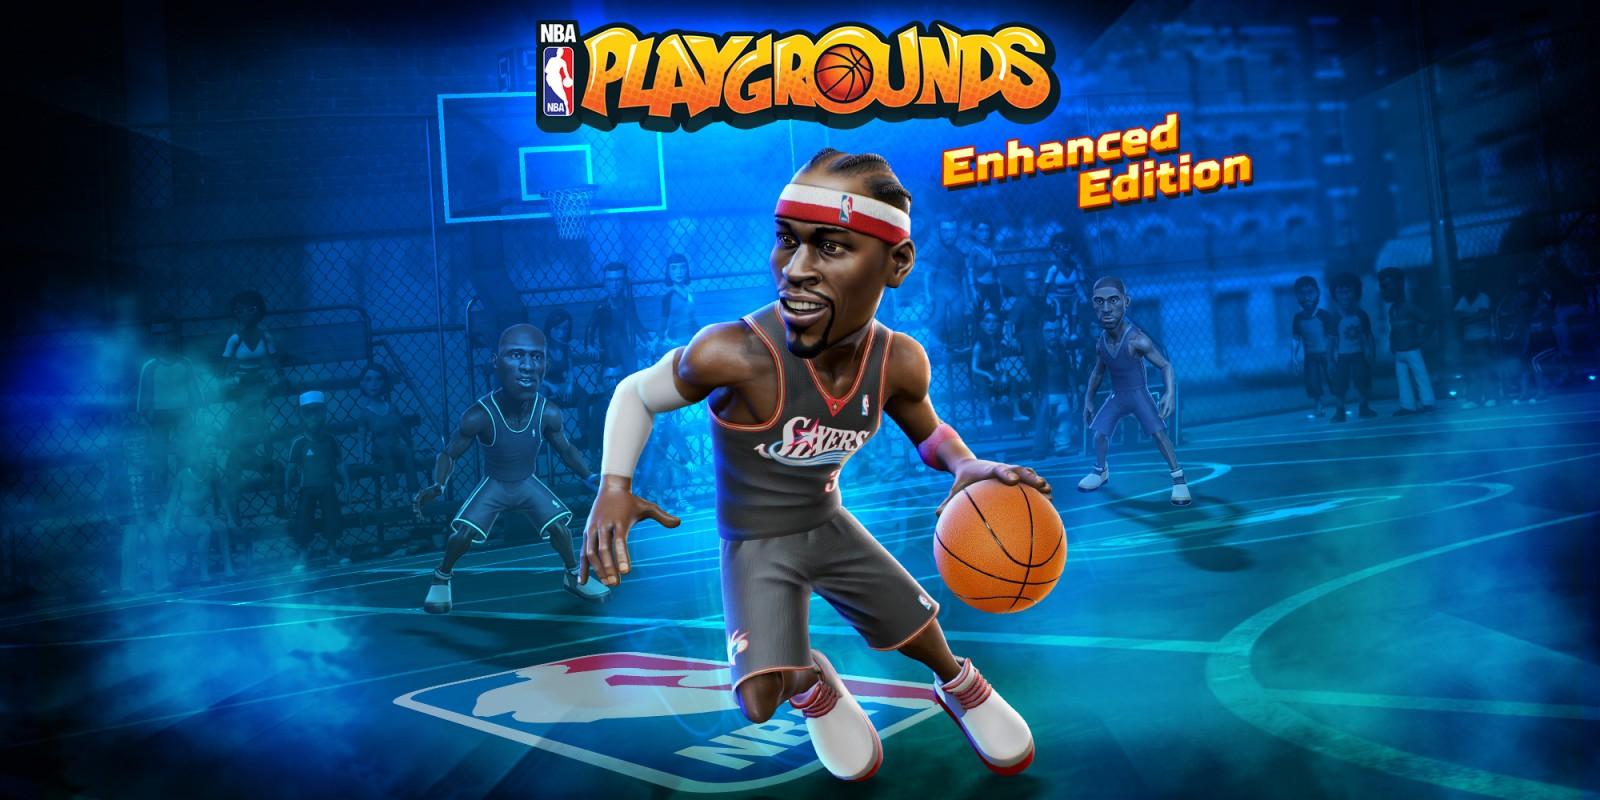 H2x1_NSwitchDS_NBAPlaygroundsEnhancedEdition_image1600w